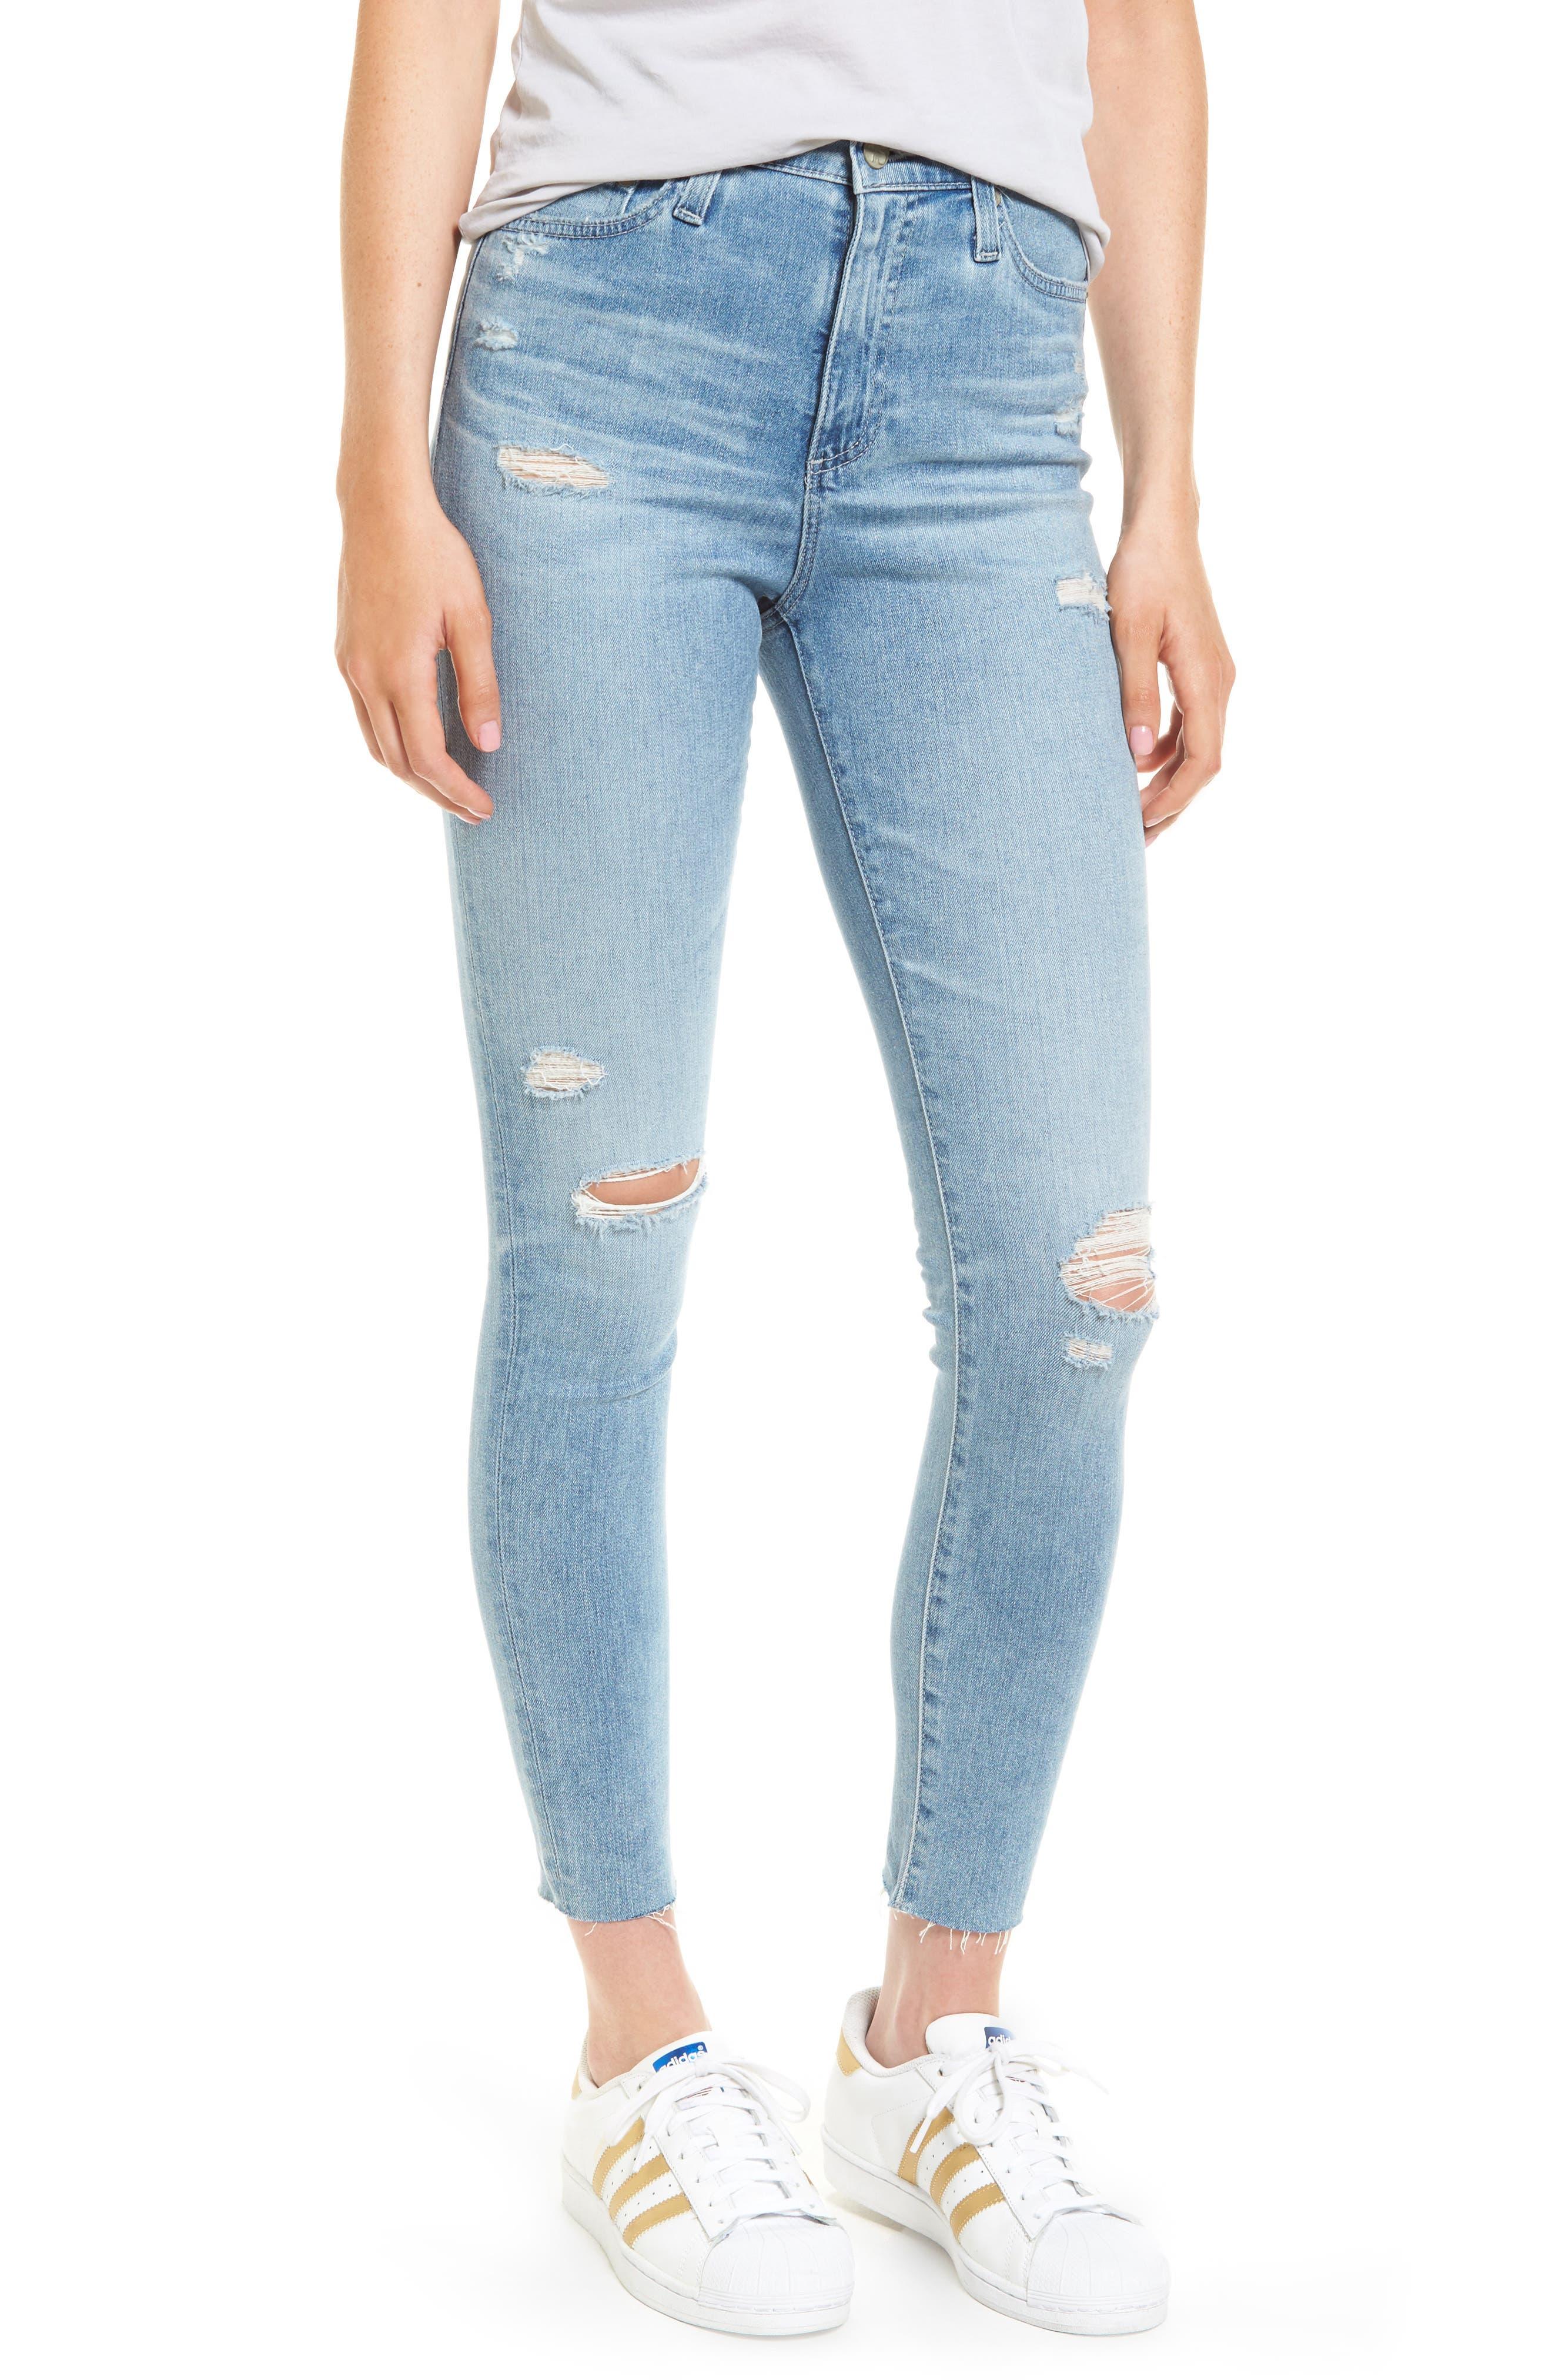 Mila High Waist Ankle Skinny Jeans,                         Main,                         color, 20 Years-Oceana Destructed